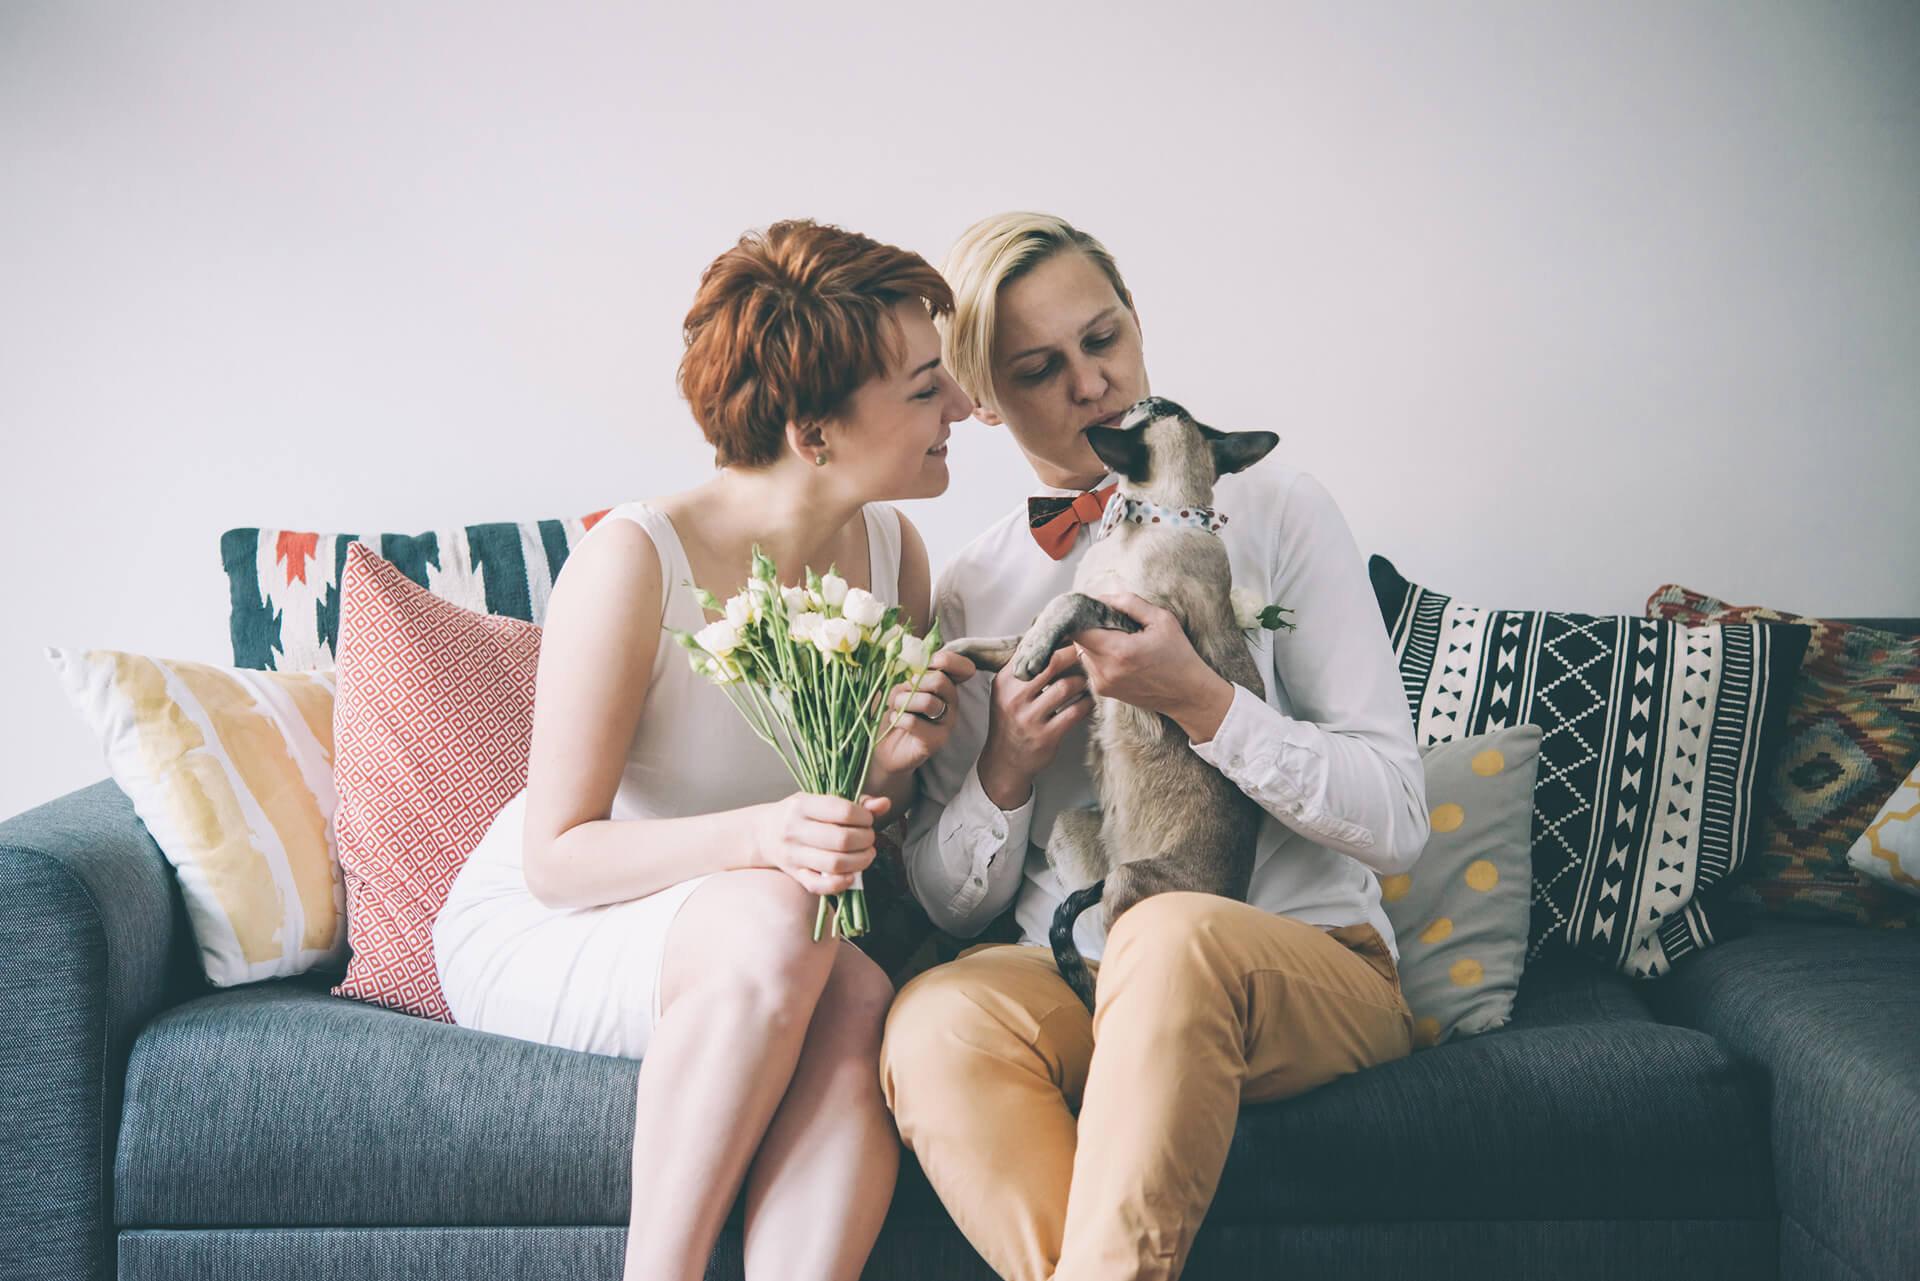 same-sex couple, marriage, divorce, child custody